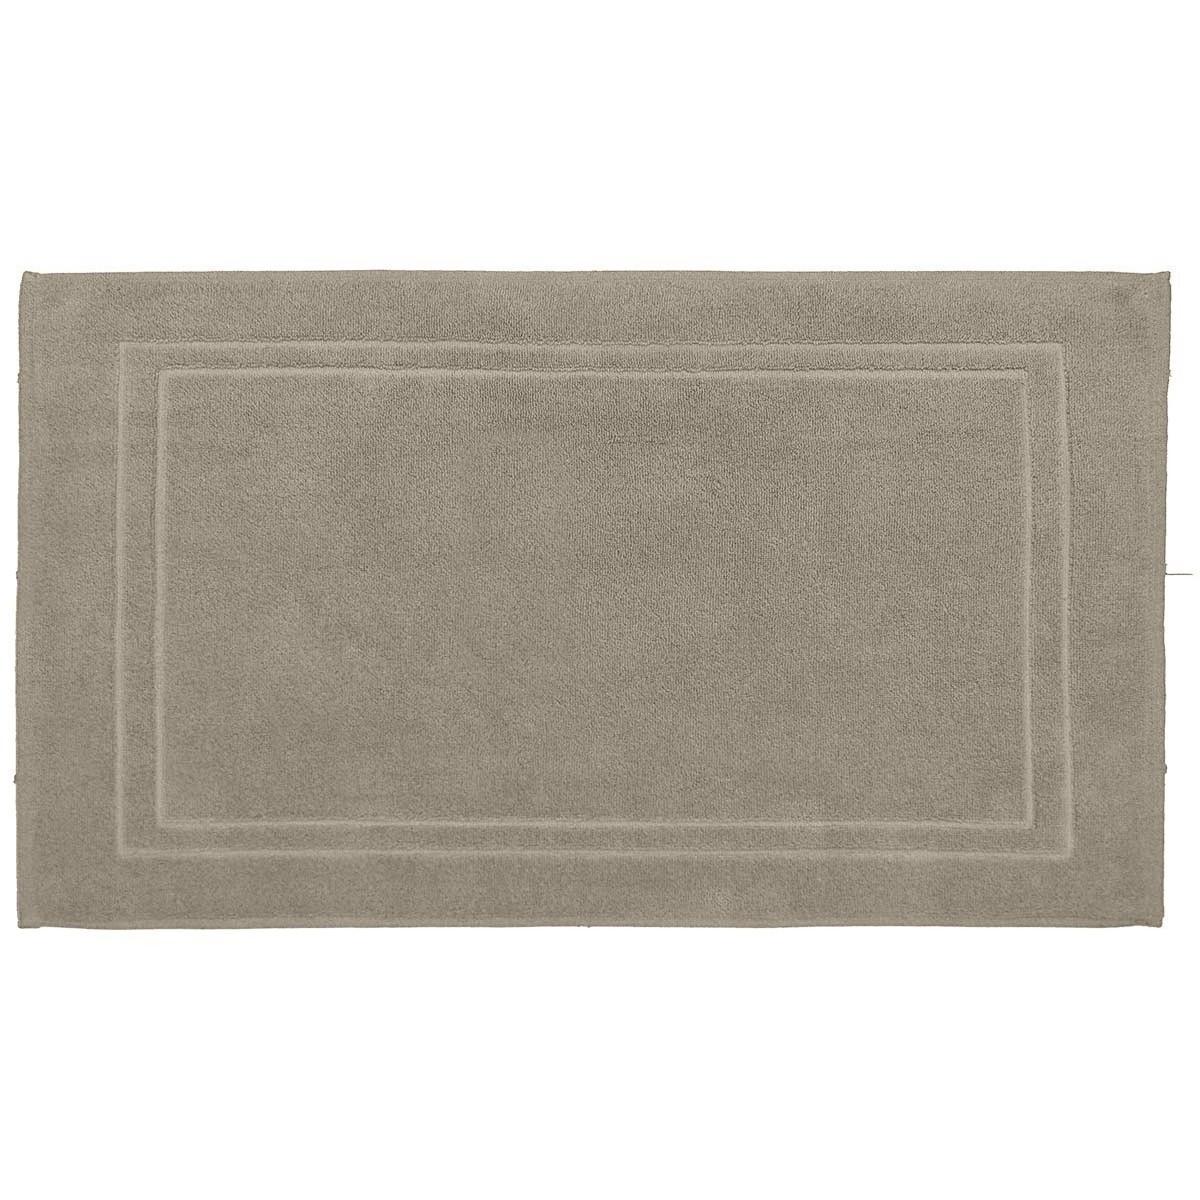 Tapis de bain 900gr/m²  Mastic 50x80 cm